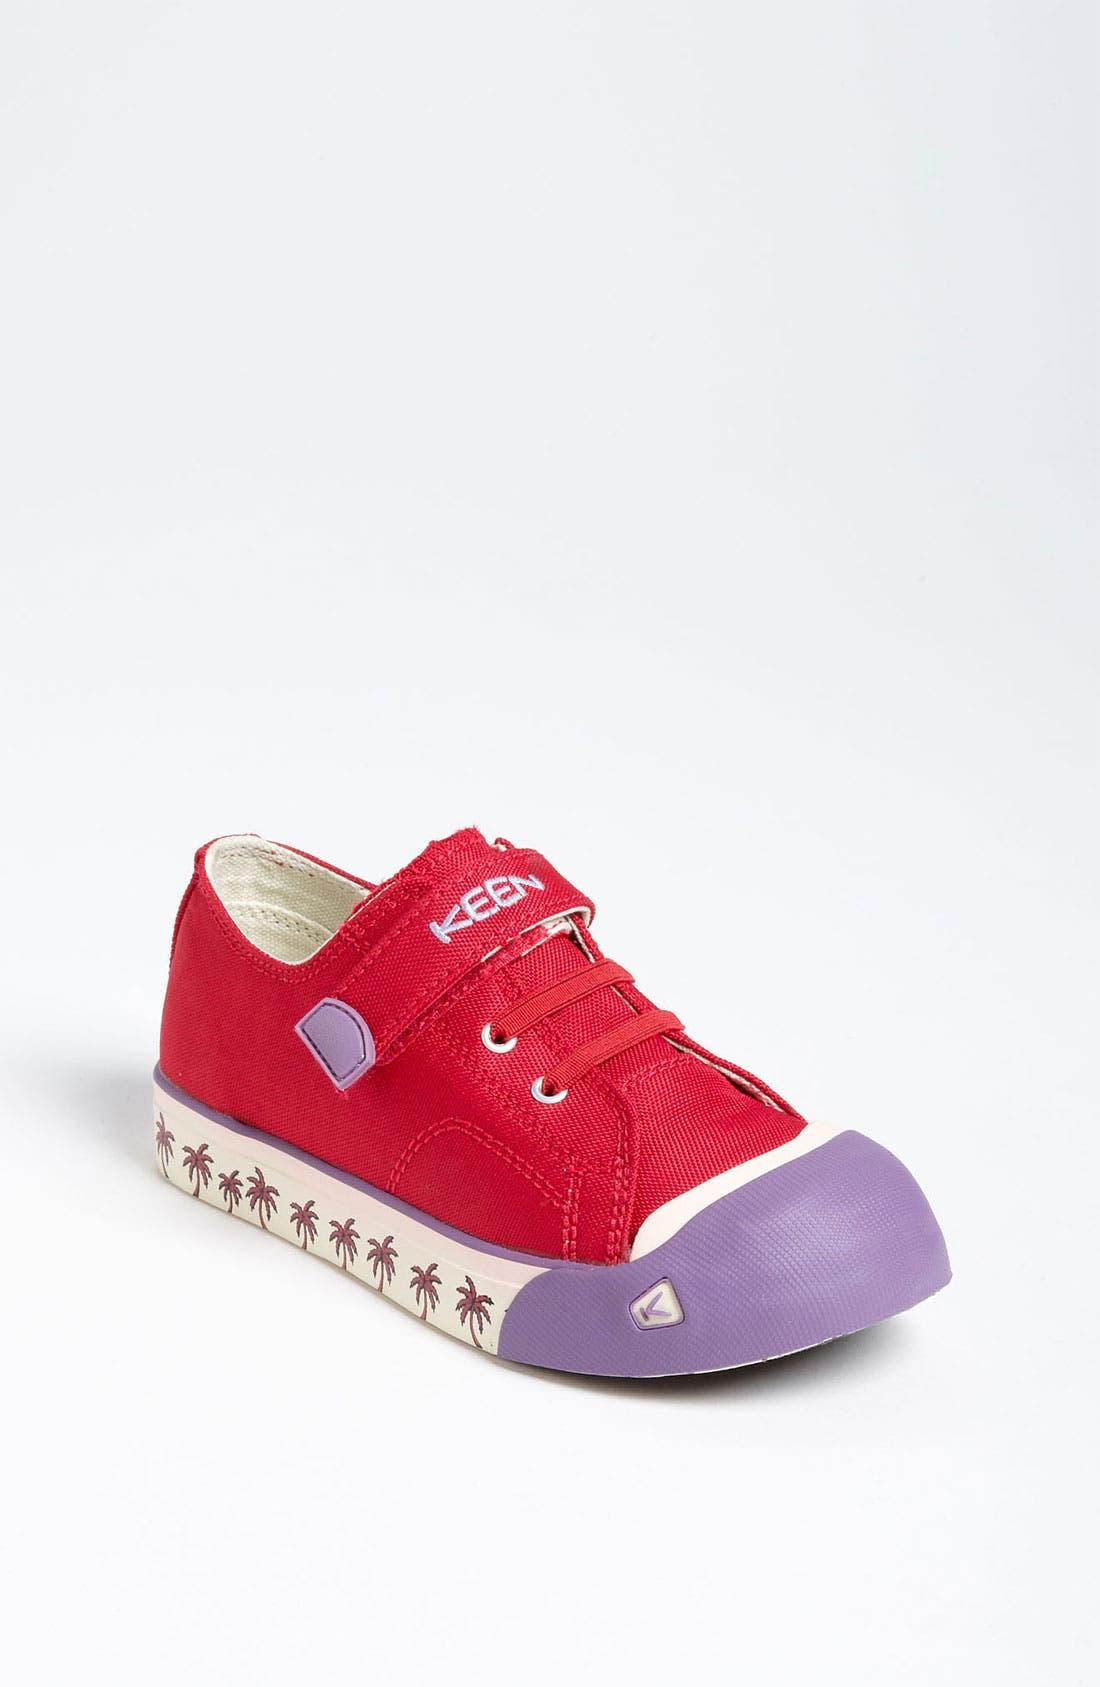 KEEN, 'Coronado' Sneaker, Main thumbnail 1, color, 600